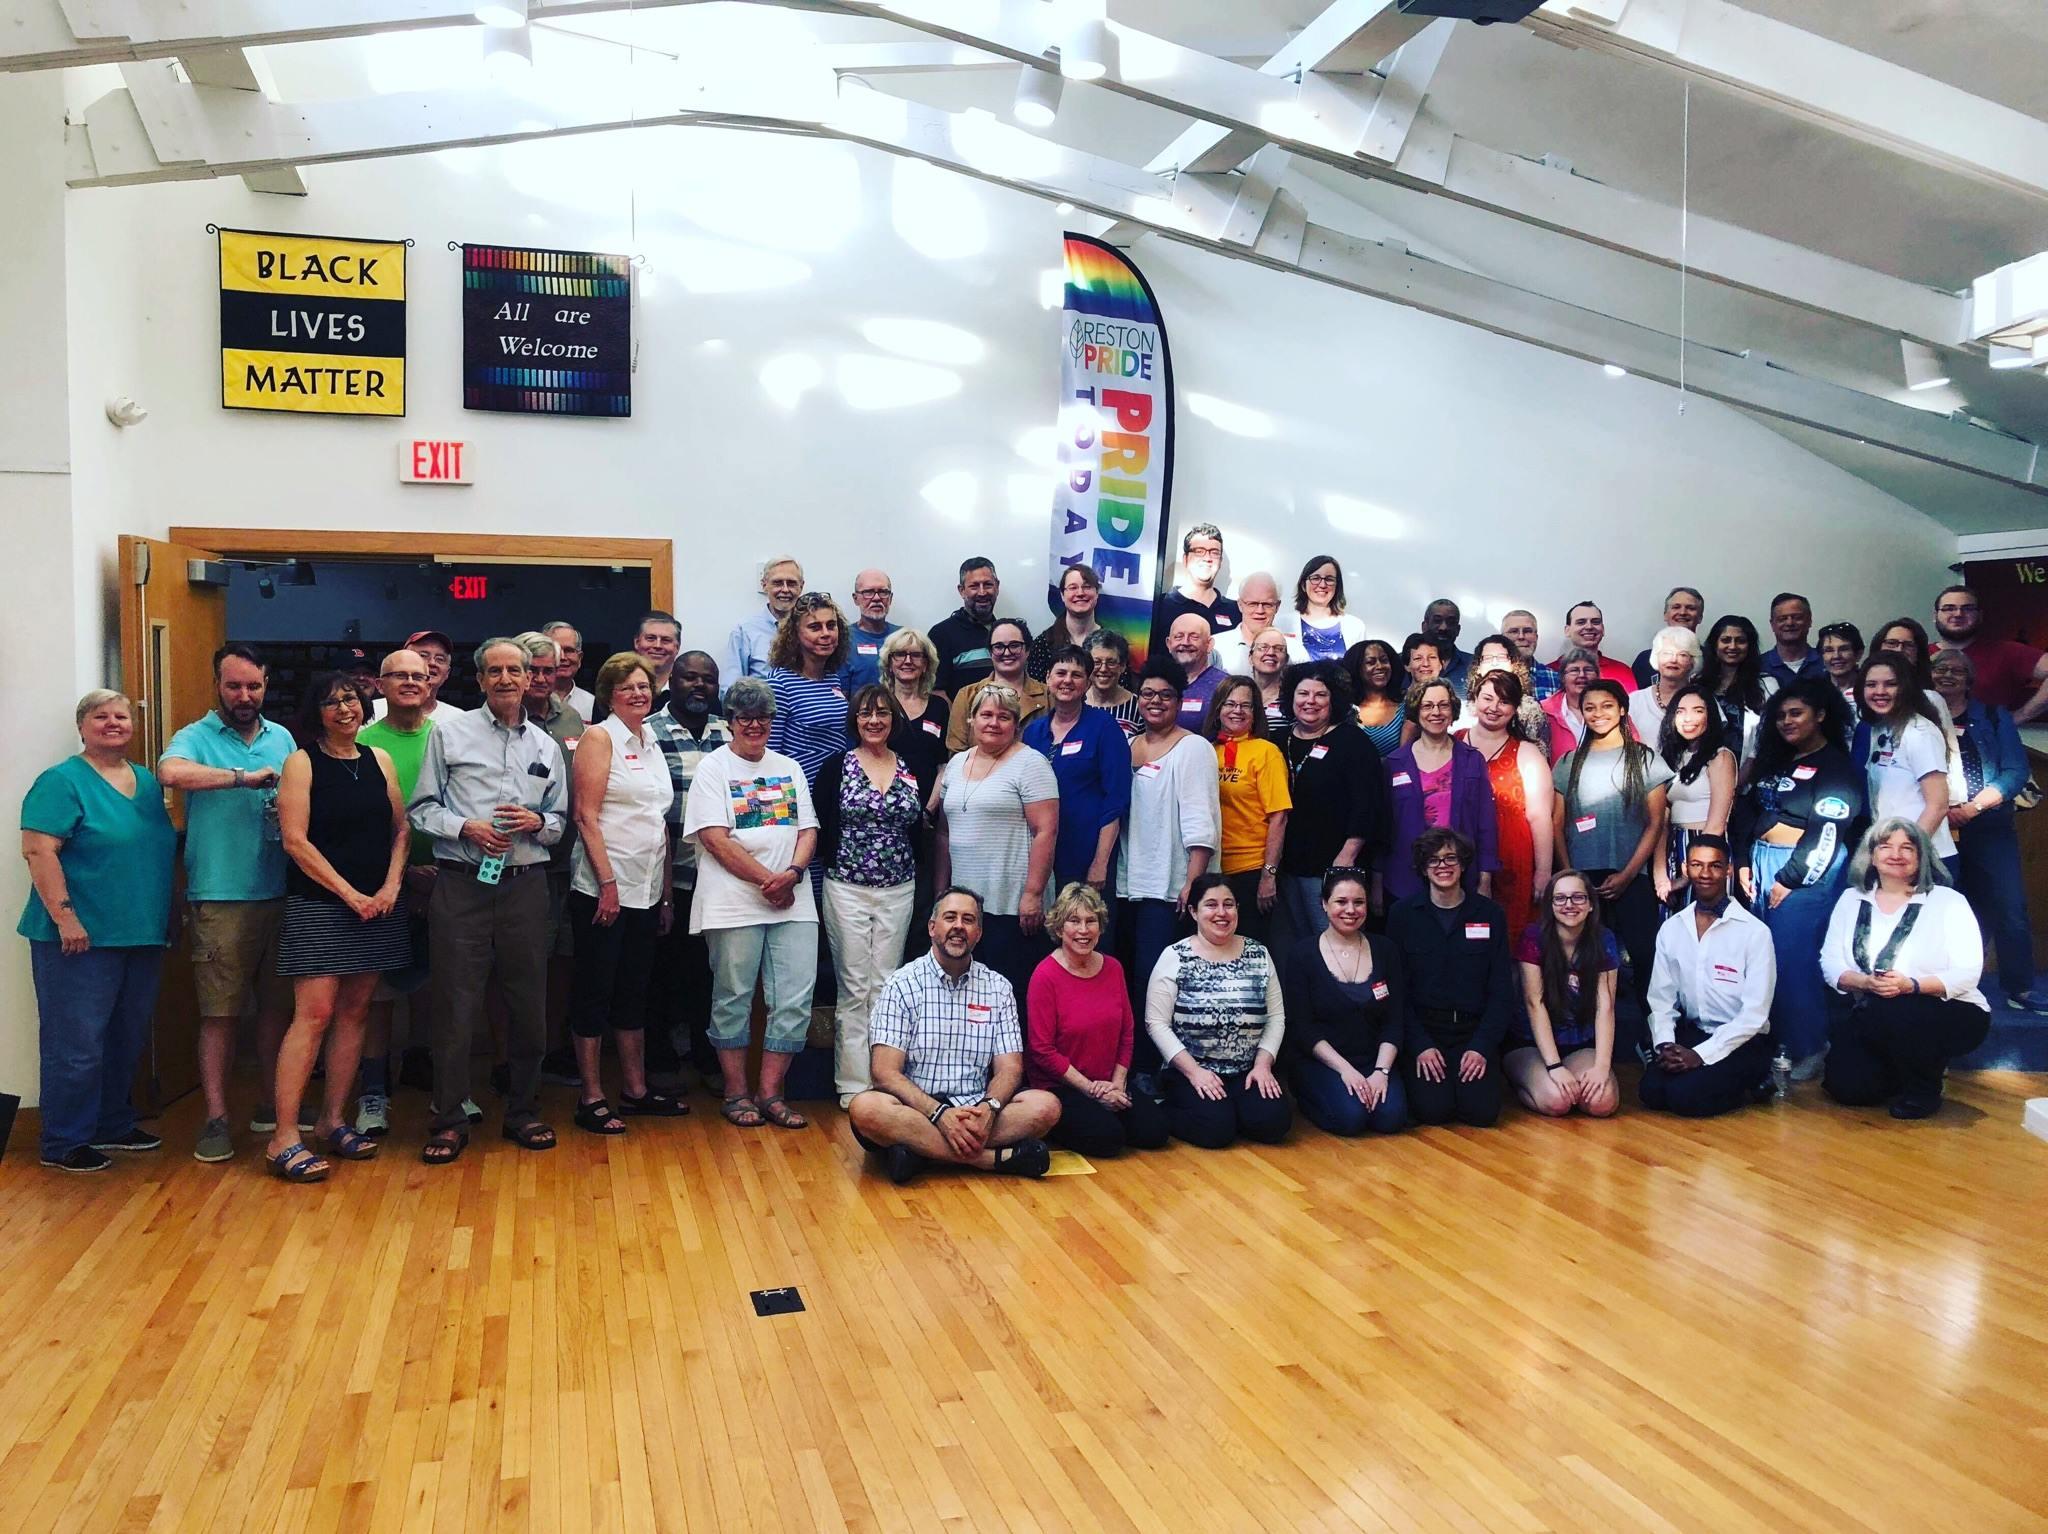 Our 60+ volunteers made Reston Pride amazing!